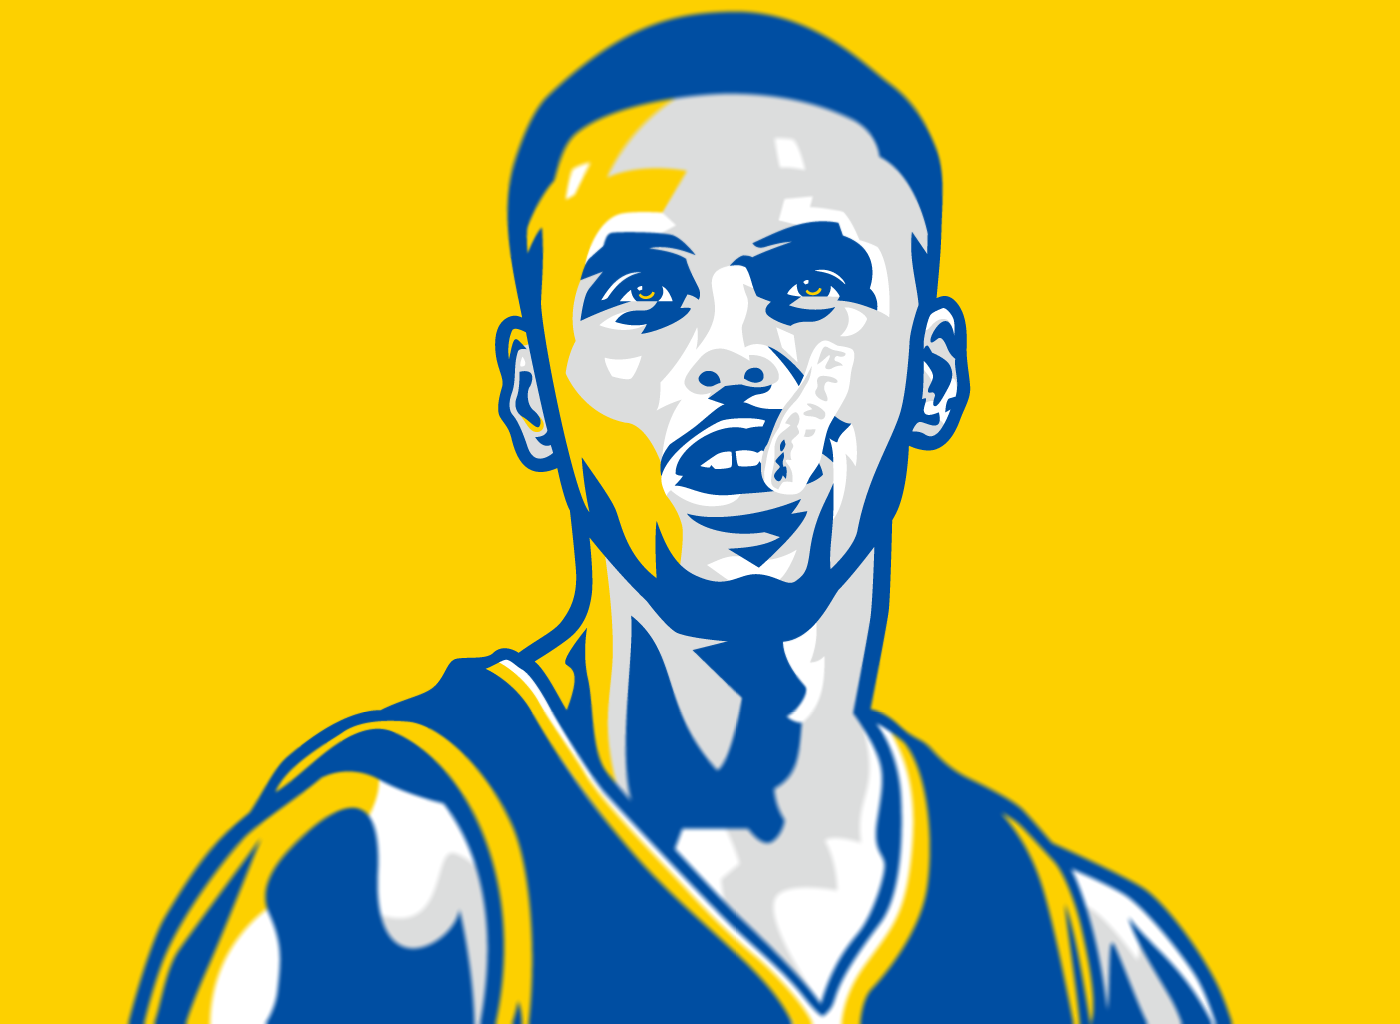 Stephen Curry Passion Illustration Stephen Curry Wallpaper Stephen Curry Curry Wallpaper